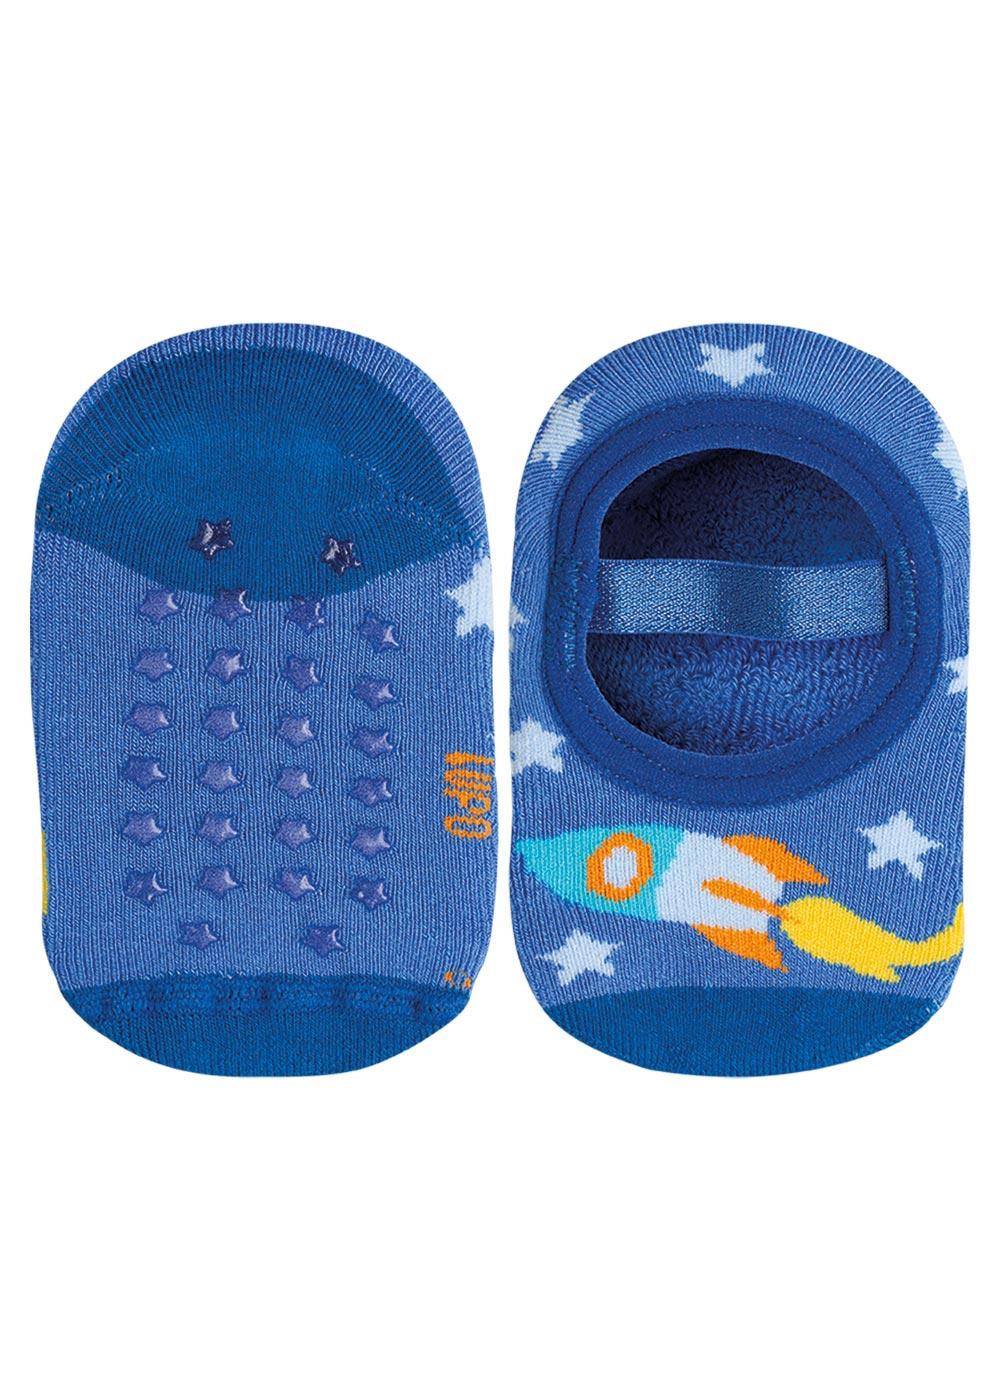 Meia Antiderrapante Infantil Azul Foguete Lupo